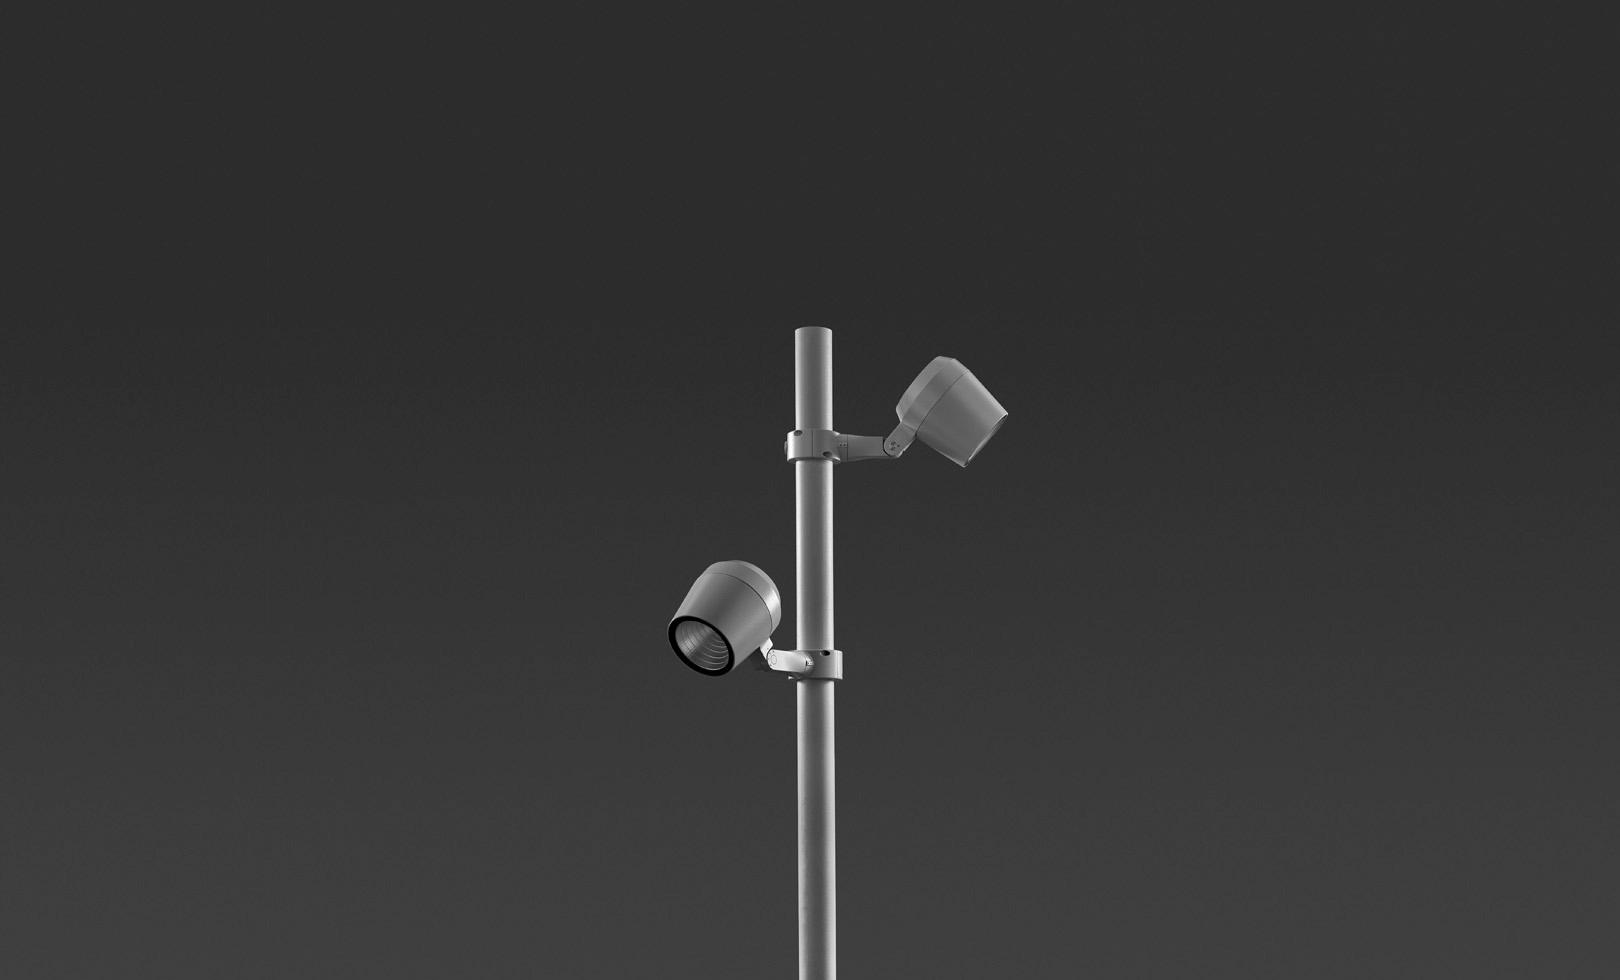 807003-807006 RING POLE MAXI LED 1